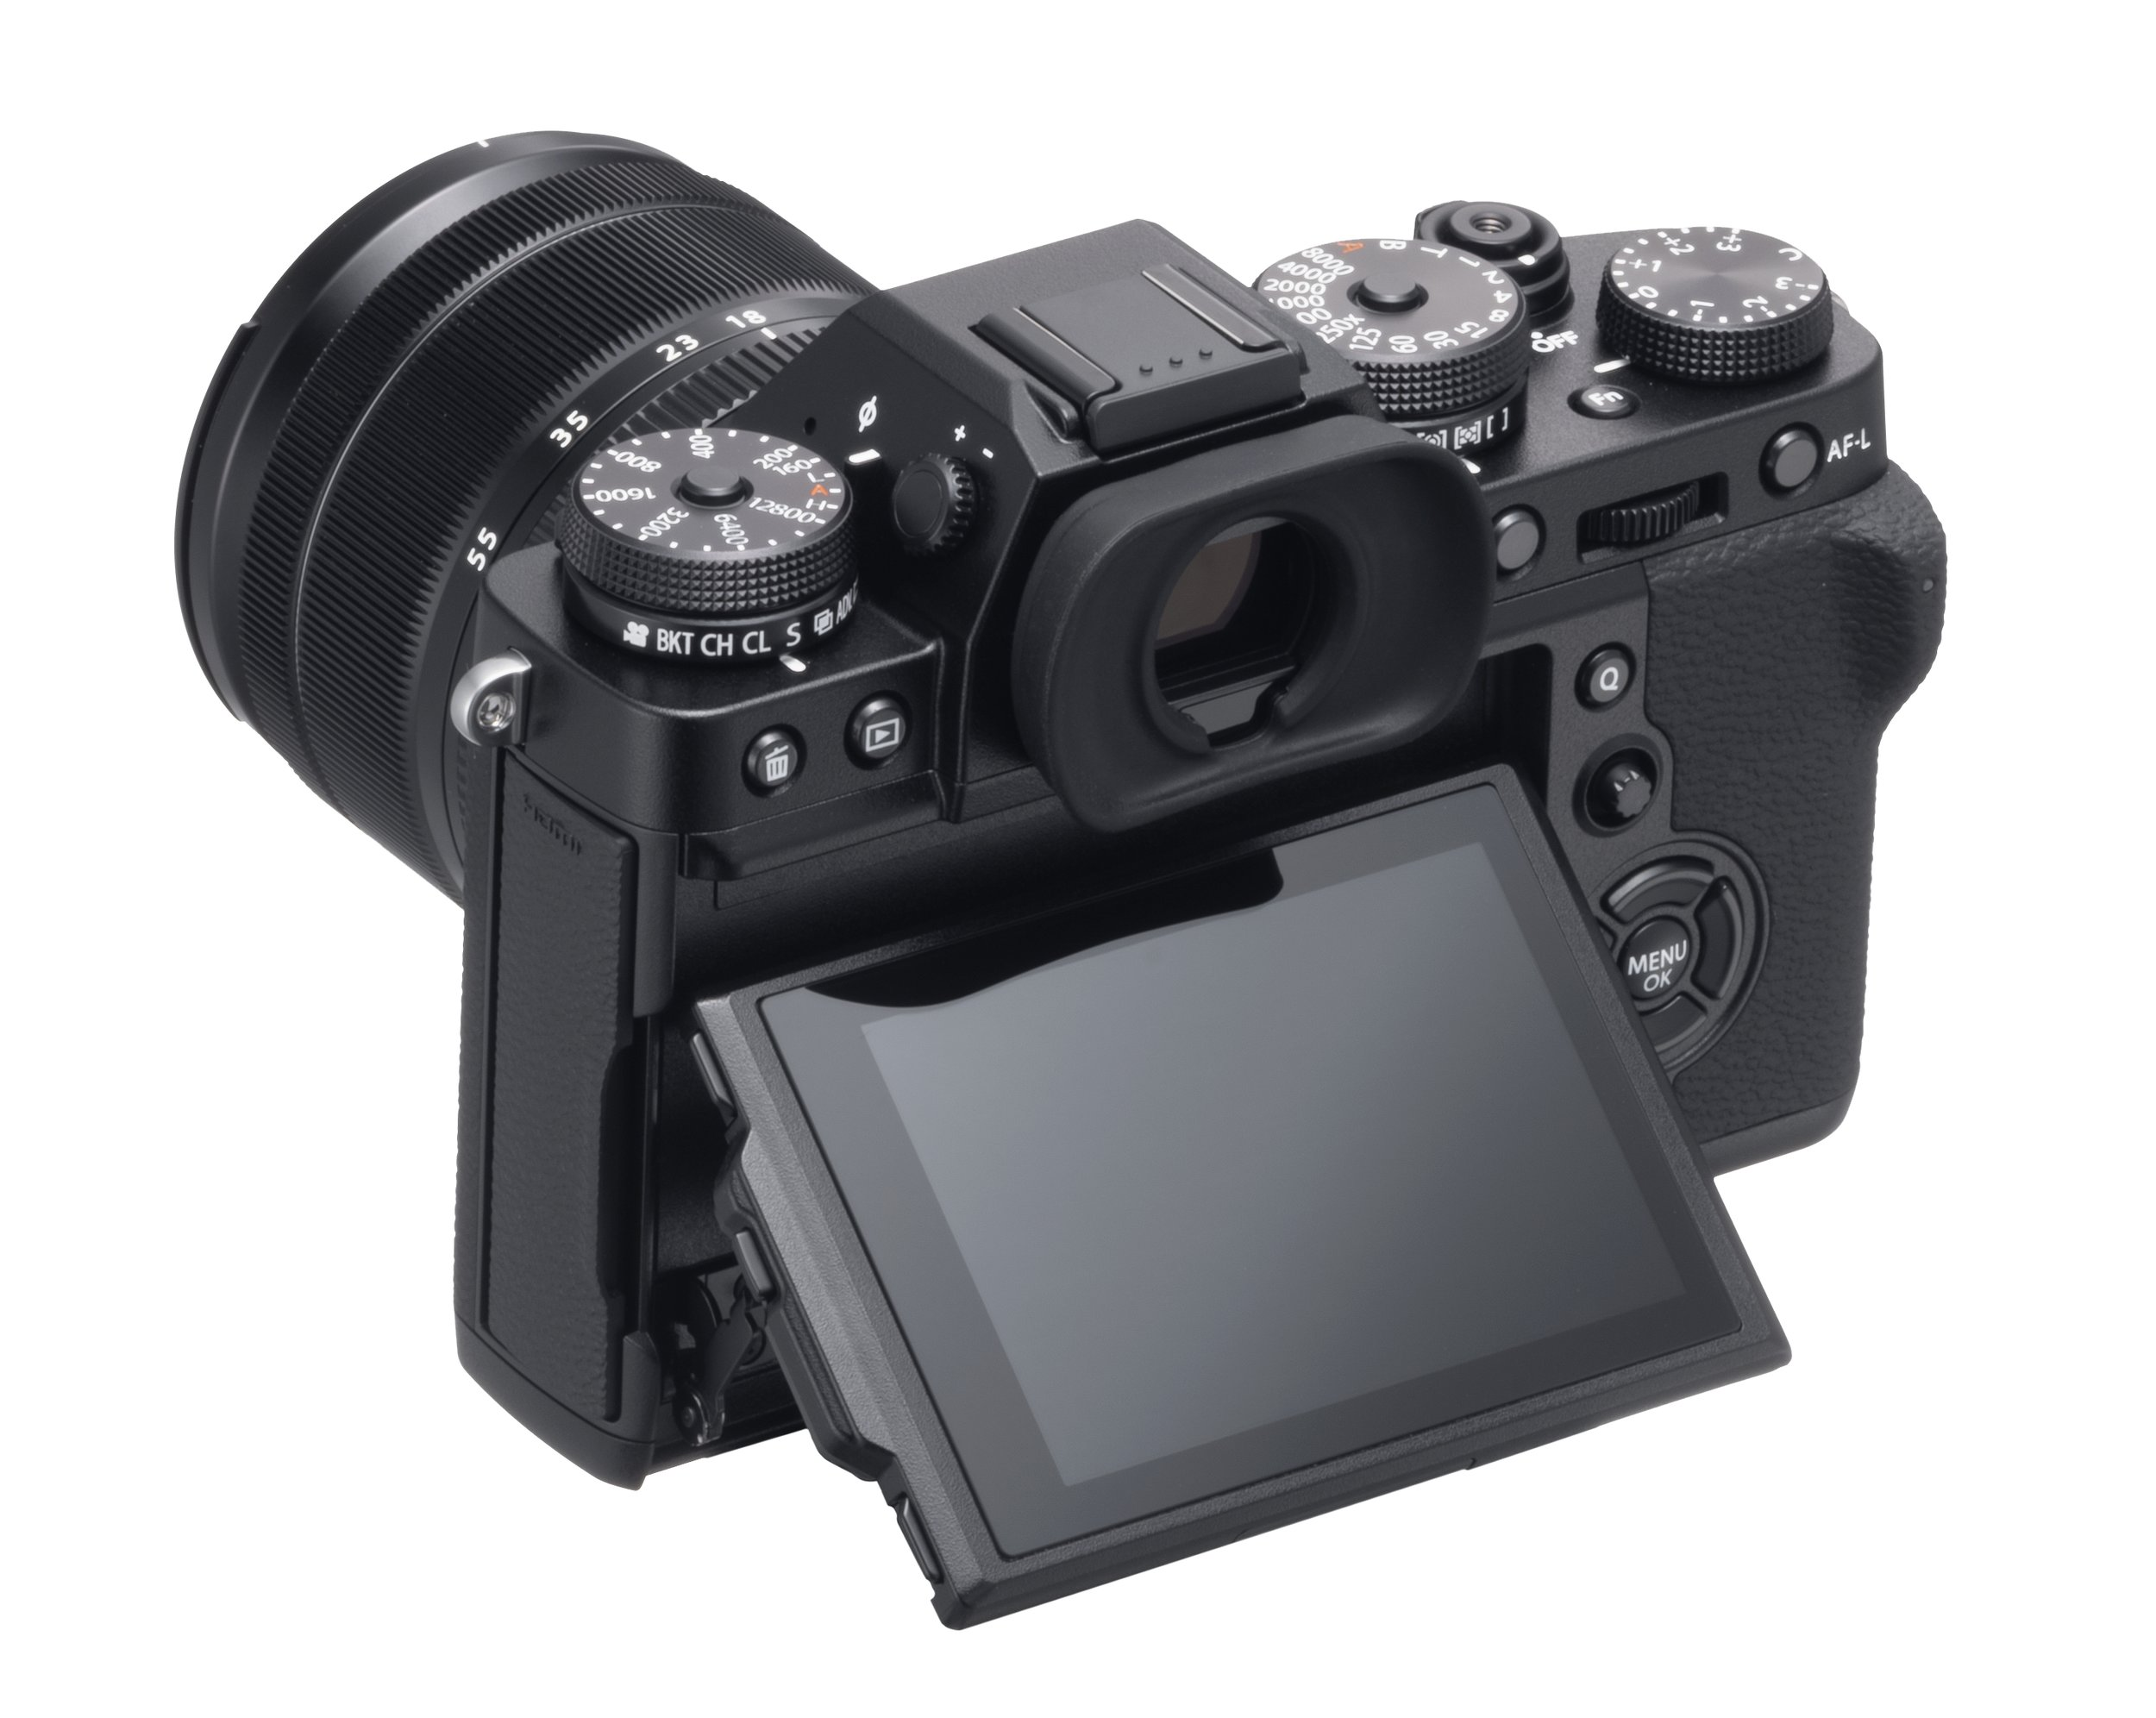 X-T3_Black_BackObl_MonitorUP+XF18-55mm - Indicative price,$2749.99 (body only).jpg